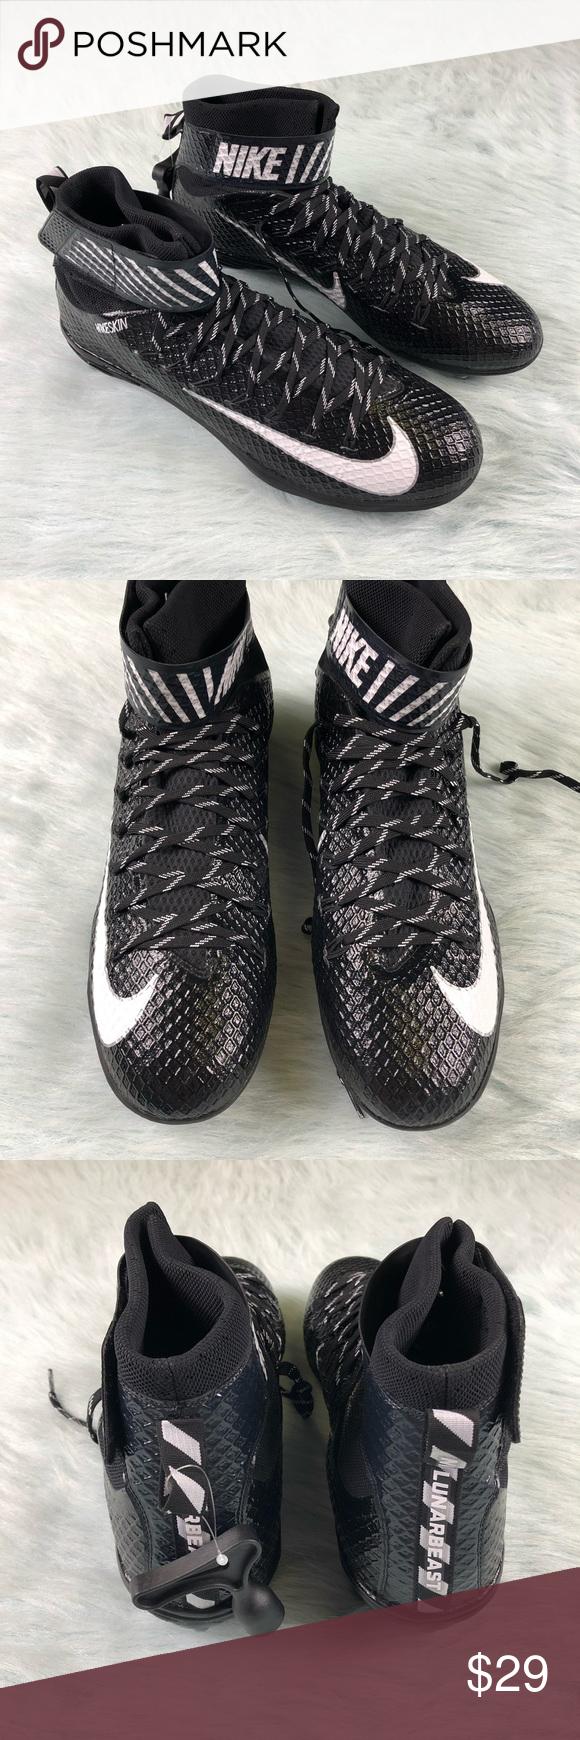 2e4cb0975cd5 Nike Lunarbeast Elite TD Football Cleats Men s 15 Men s size 15 Nike Force  Lunarbeast Elite TD Football cleats 847725-011. BRAND NEW.